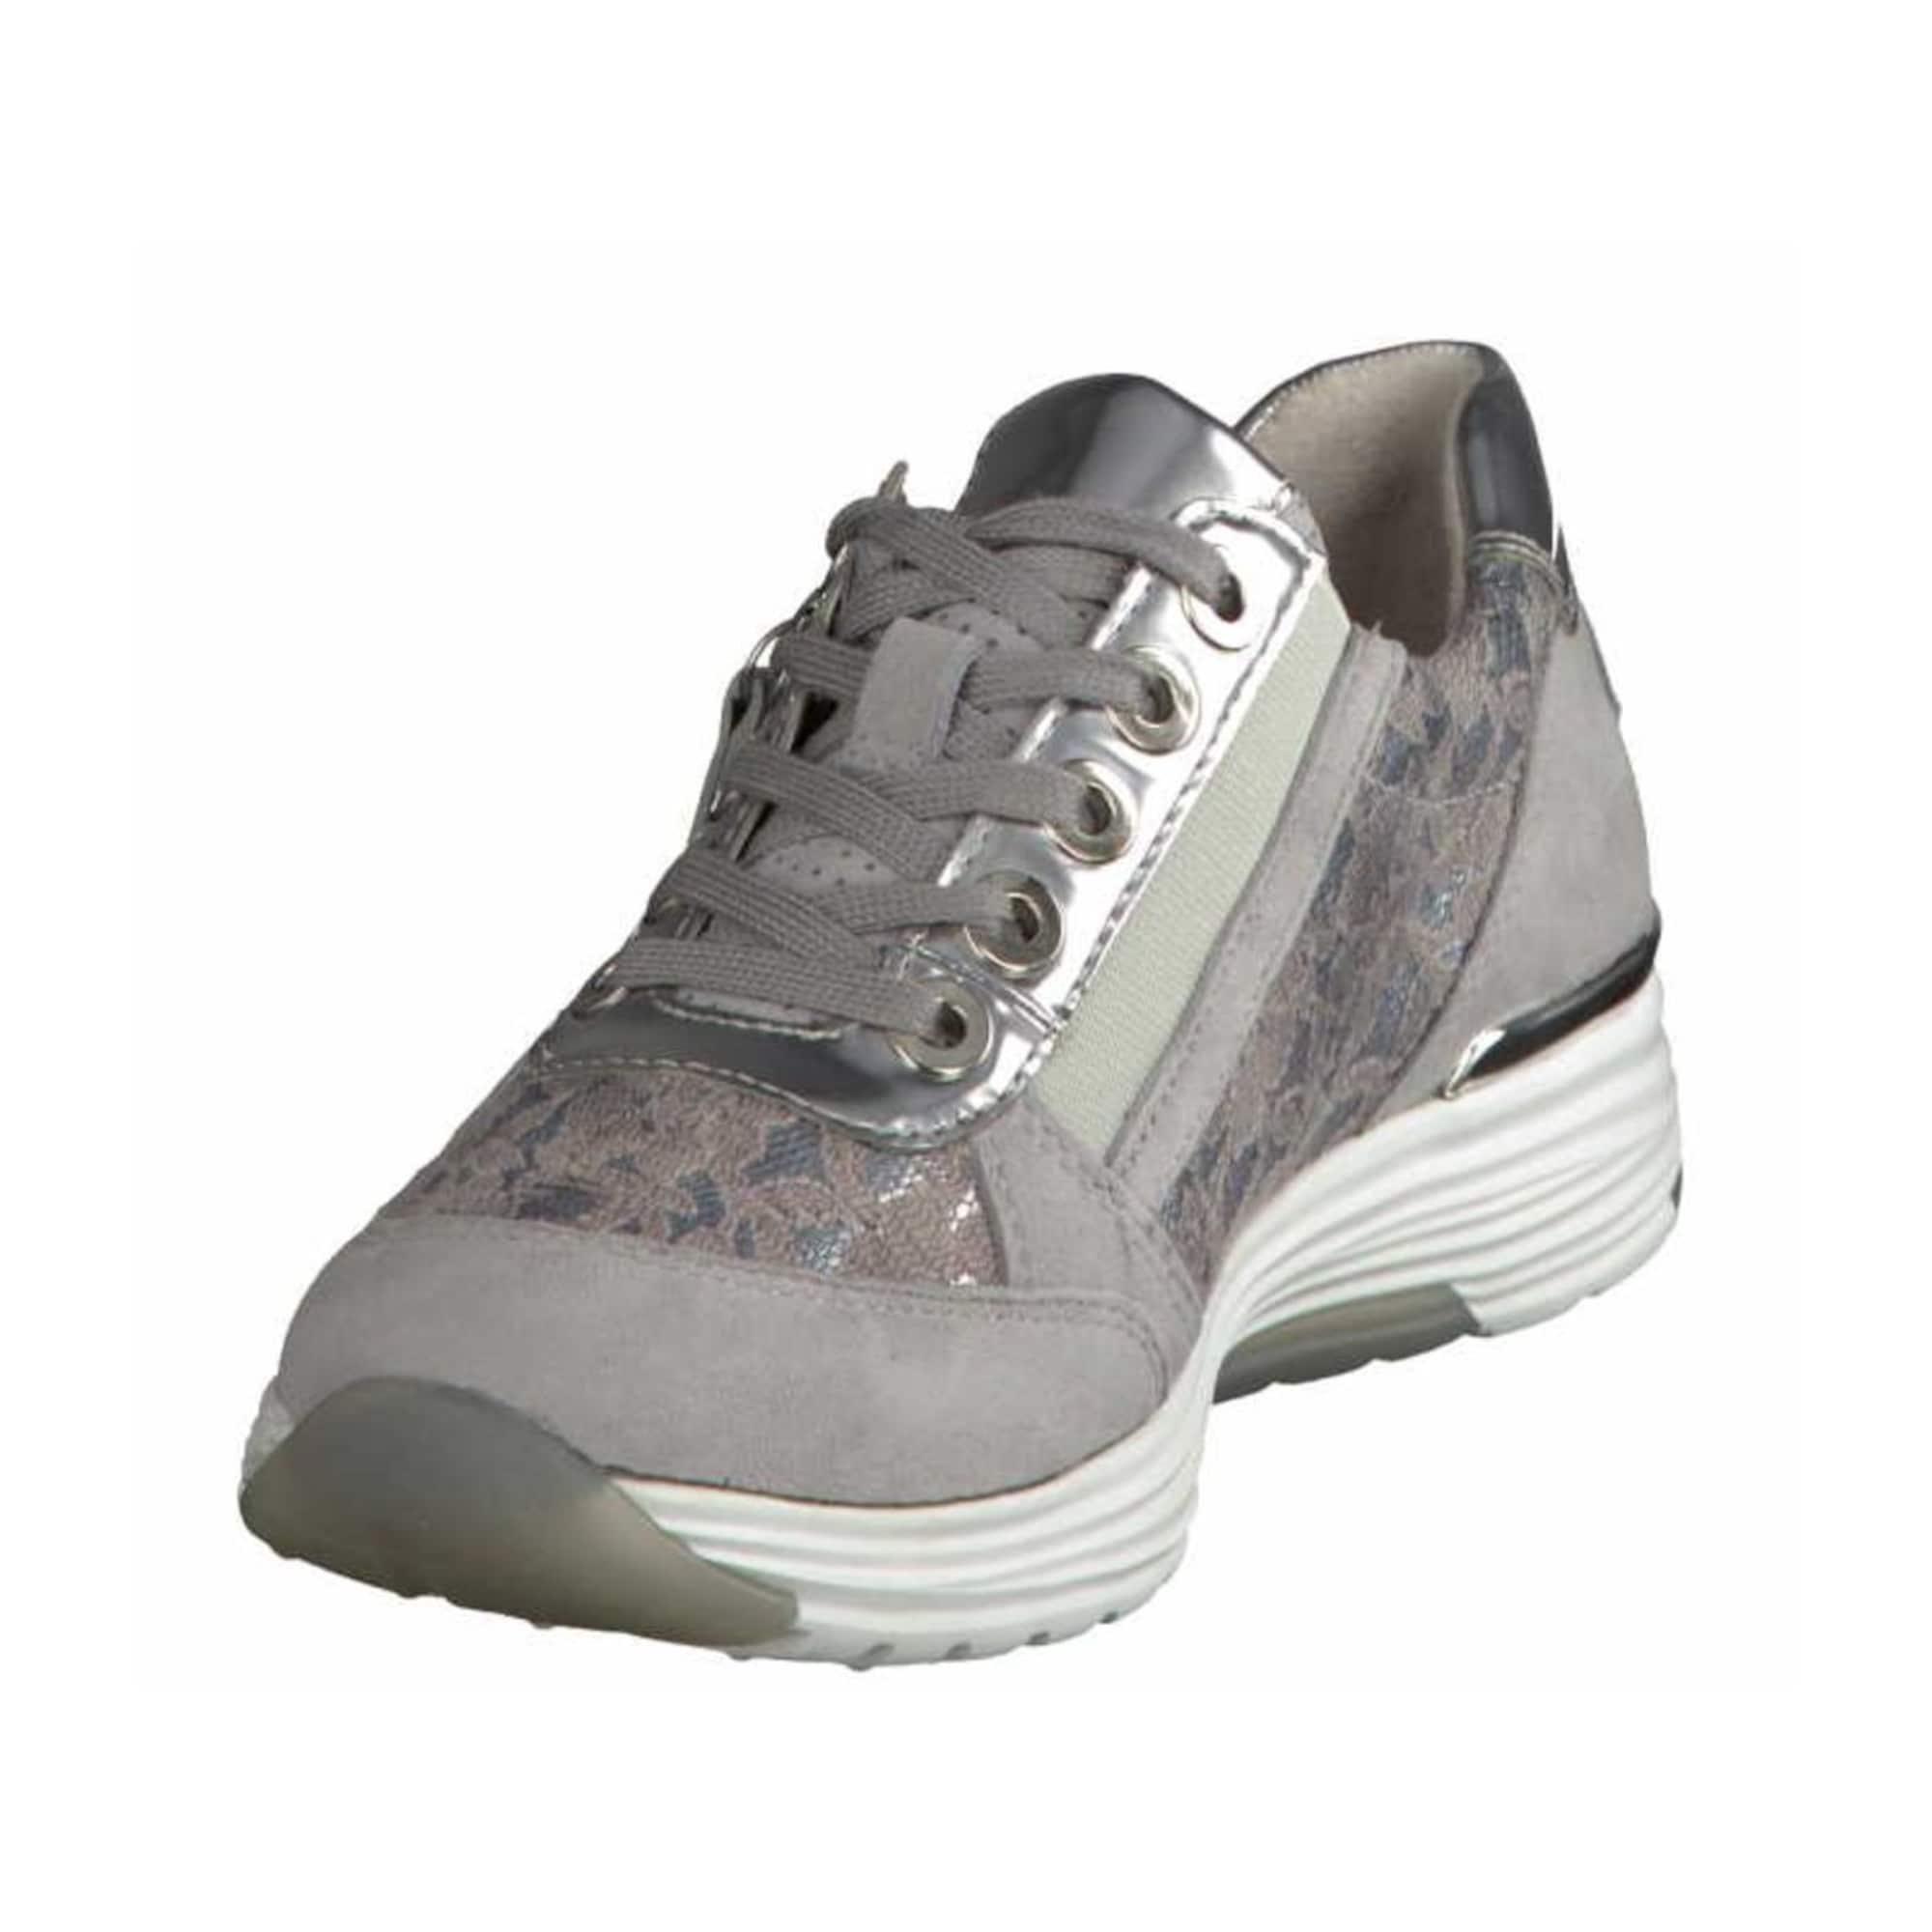 Schnürschuhe | Schuhe > Schnürschuhe | Silbergrau | Gabor